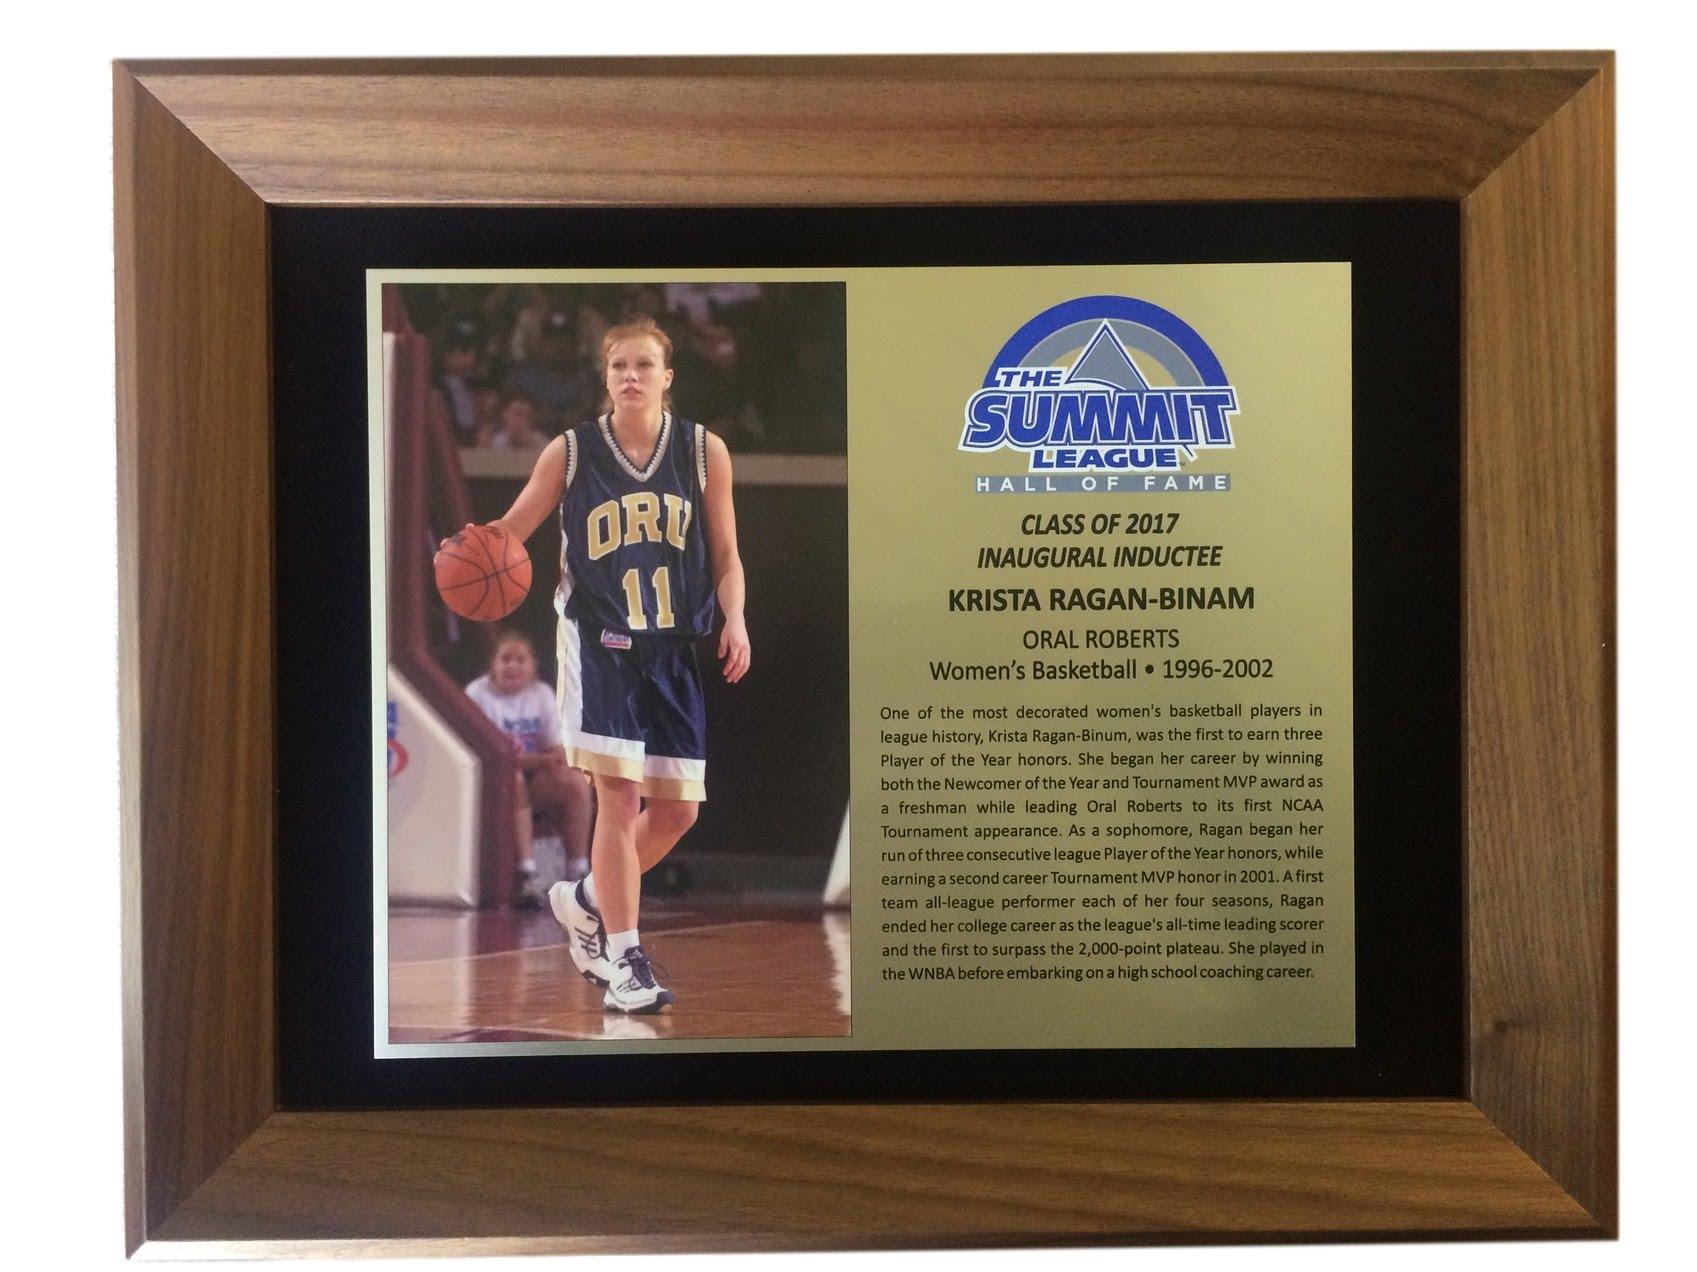 Krista Ragan-Binam's Hall of Fame Plaque